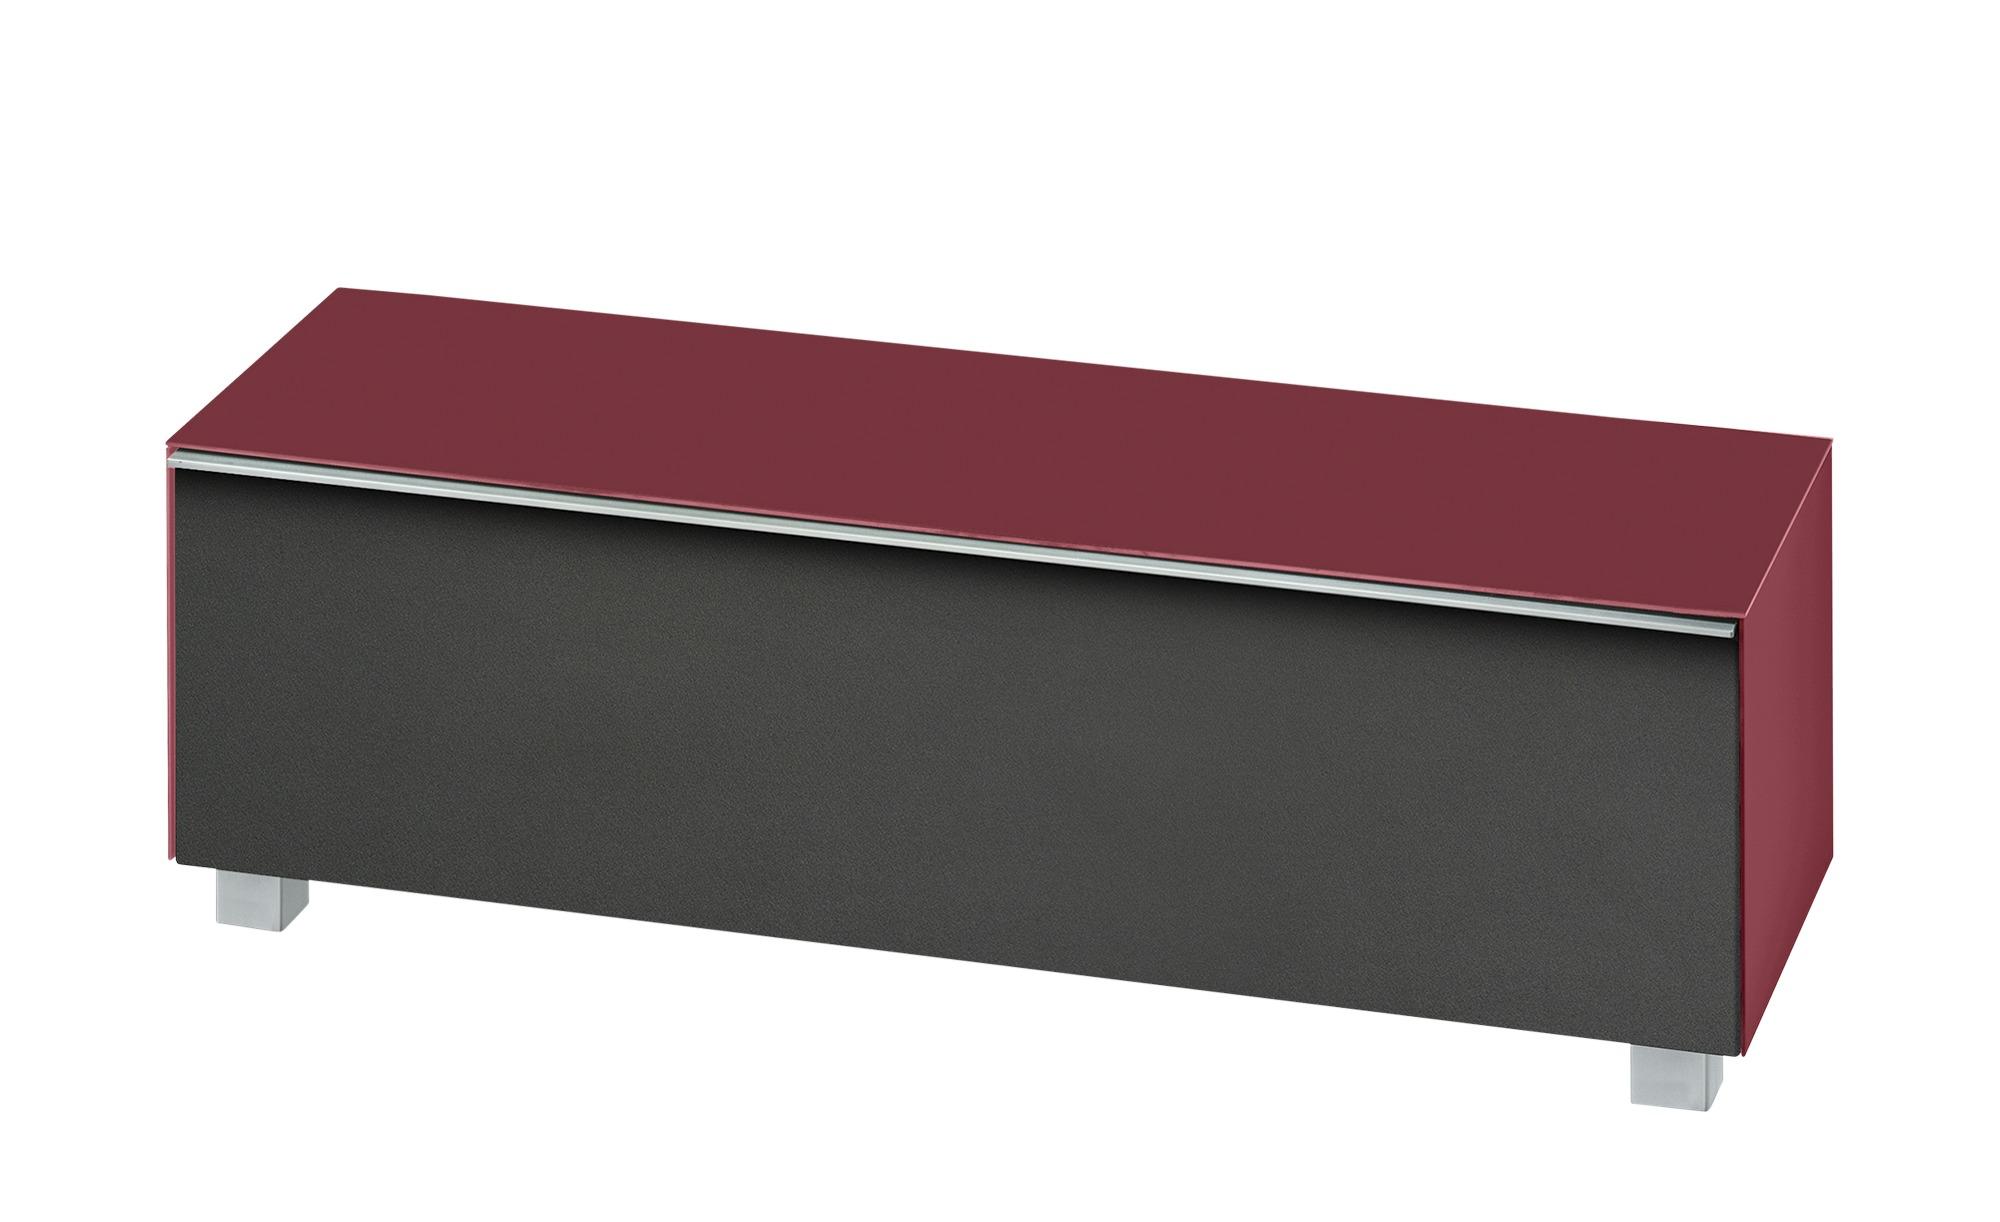 Lowboard  Soundbase S ¦ rot ¦ Maße (cm): B: 140 H: 43 T: 42 Kommoden & Sideboards > Lowboards - Höffner